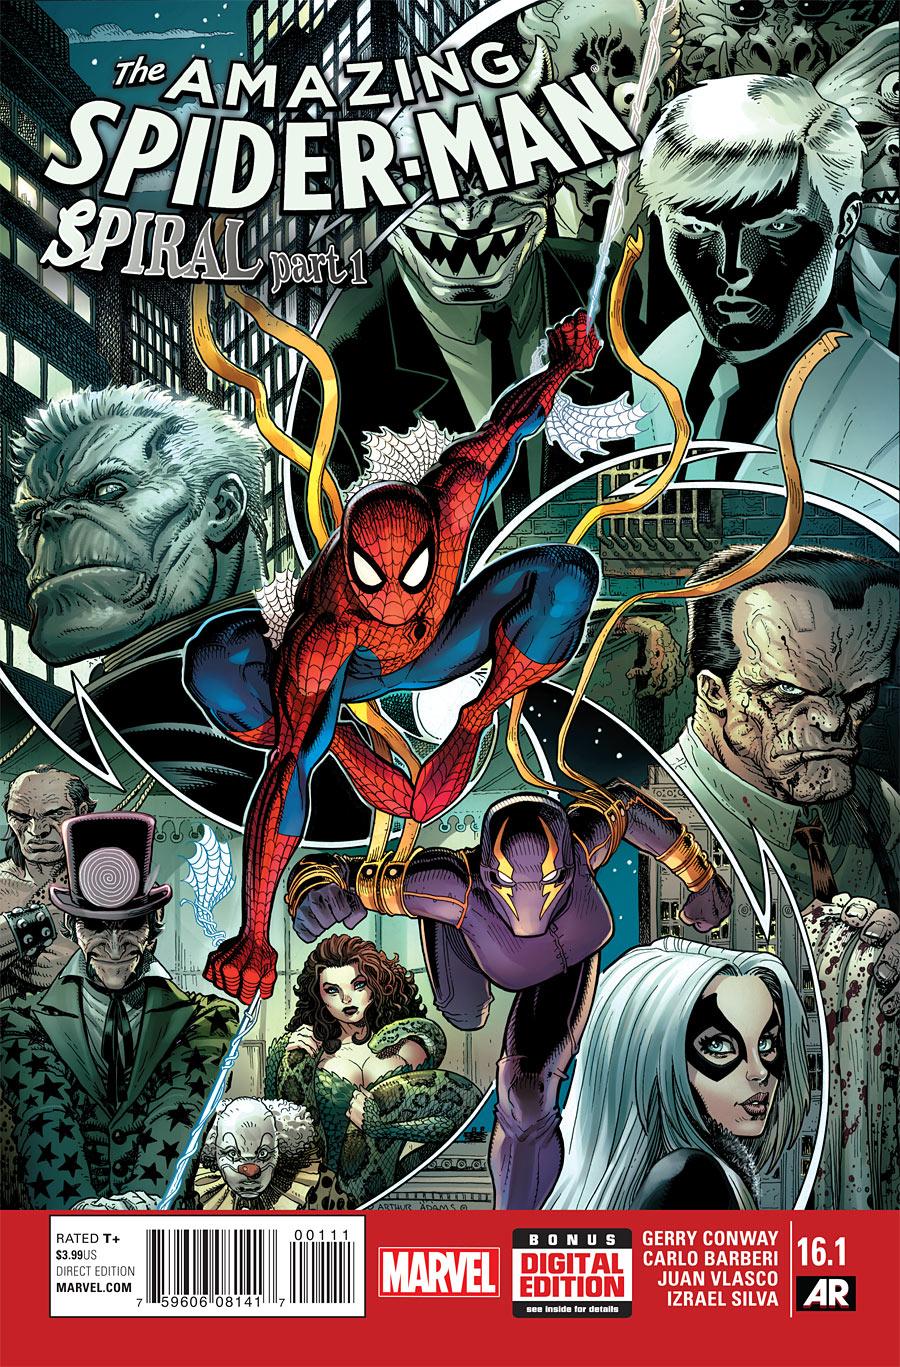 The Amazing Spider-Man #16.1